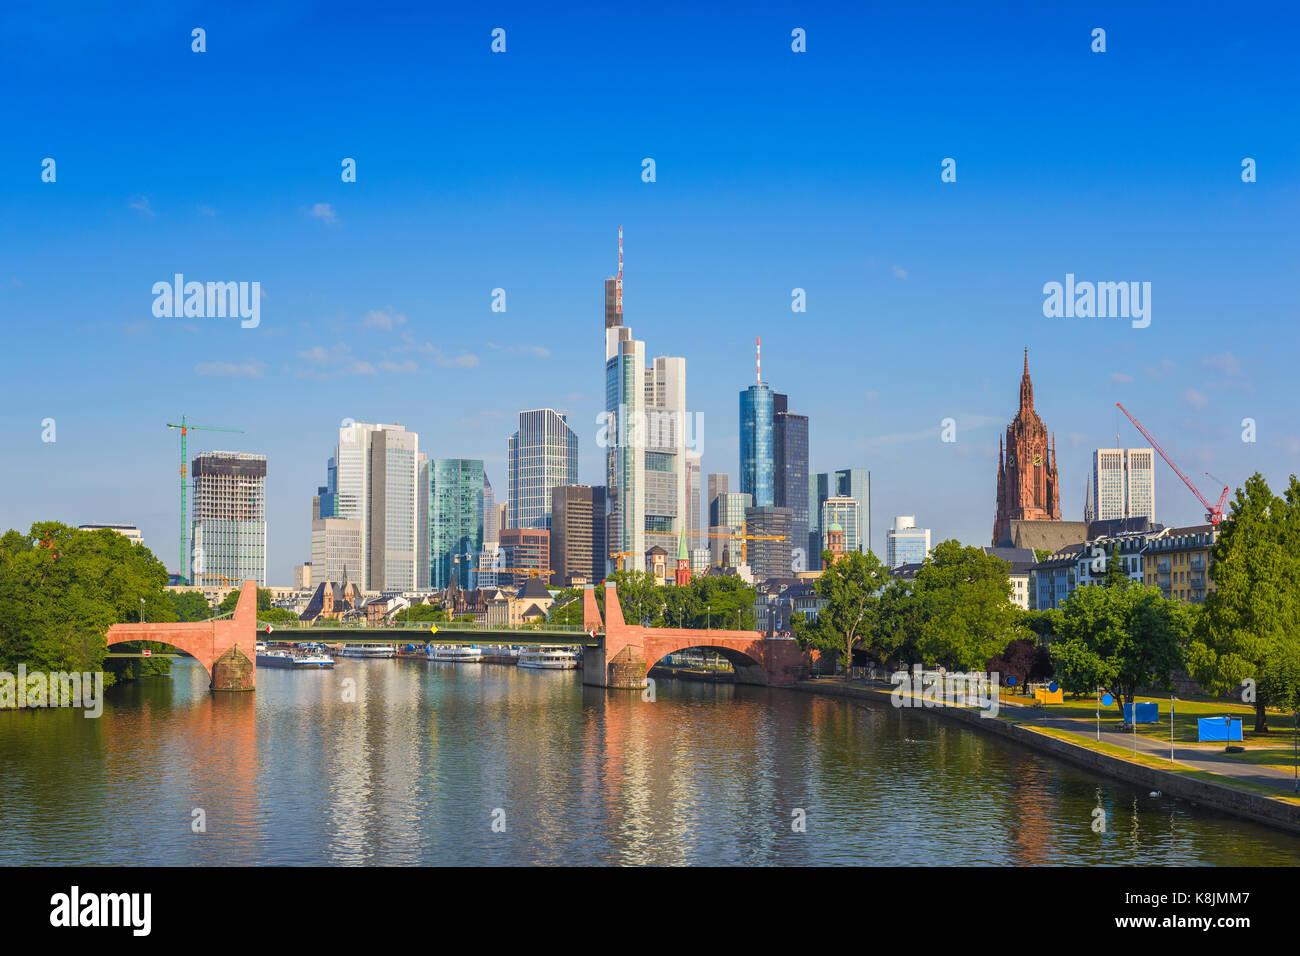 Frankfurt city skyline at business district, Frankfurt, Germany - Stock Image